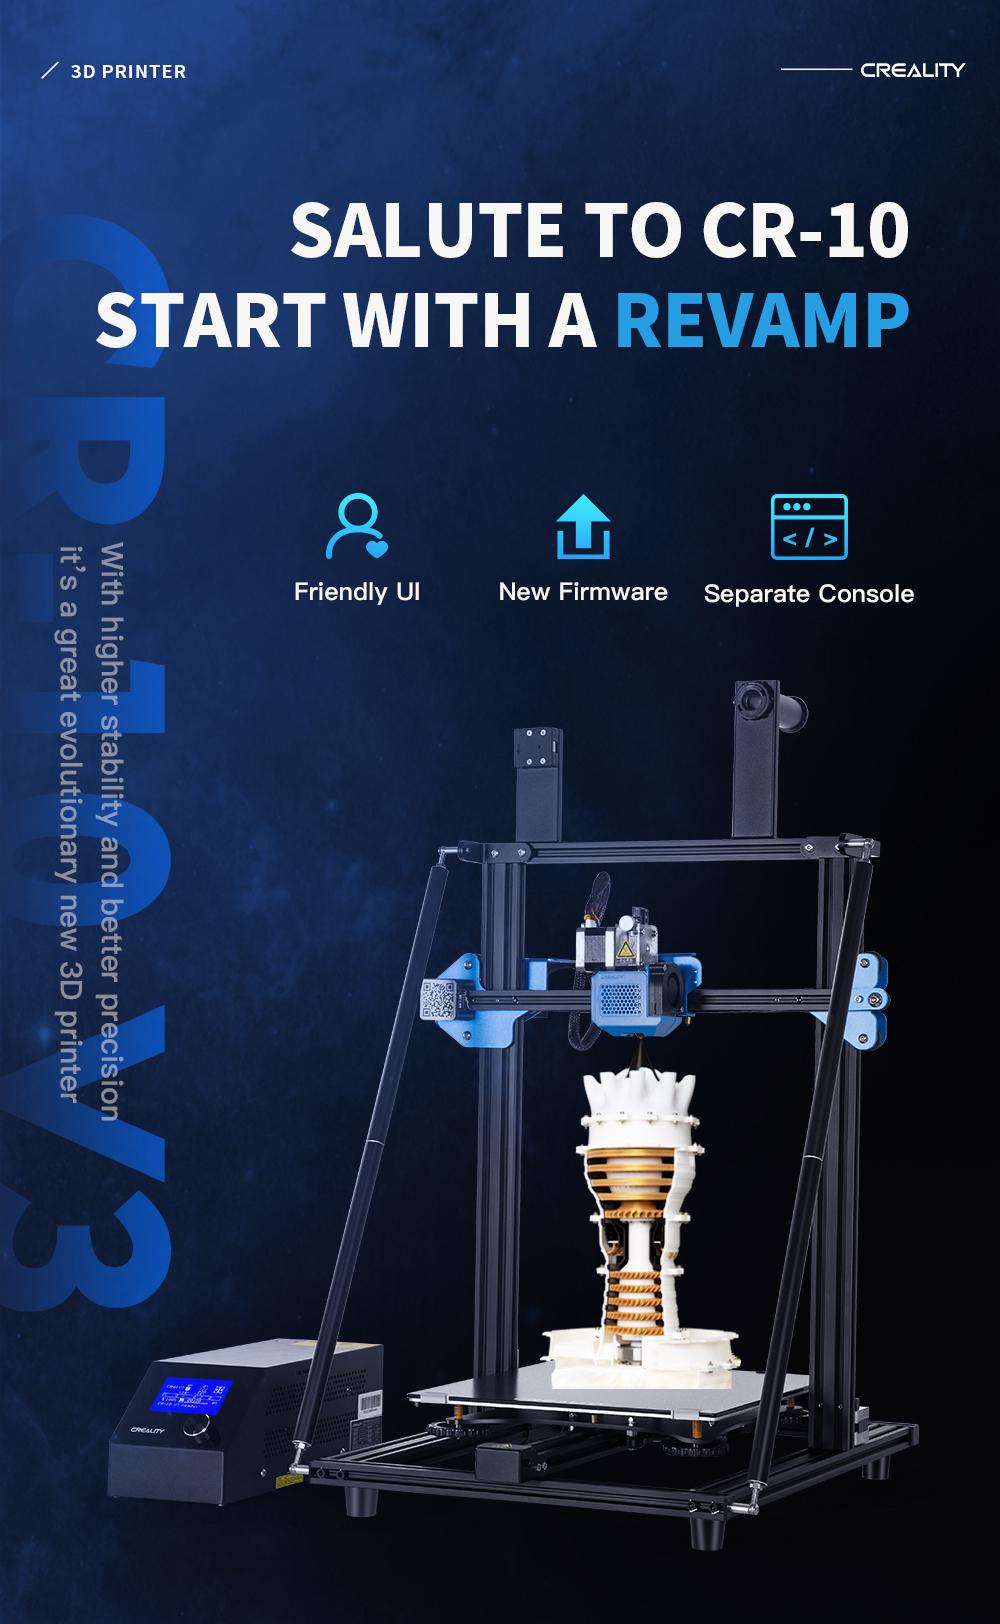 Creality3D CR-10 V3 3D-Drucker Bausatz - 300x300x400mm - Produktvorstellung